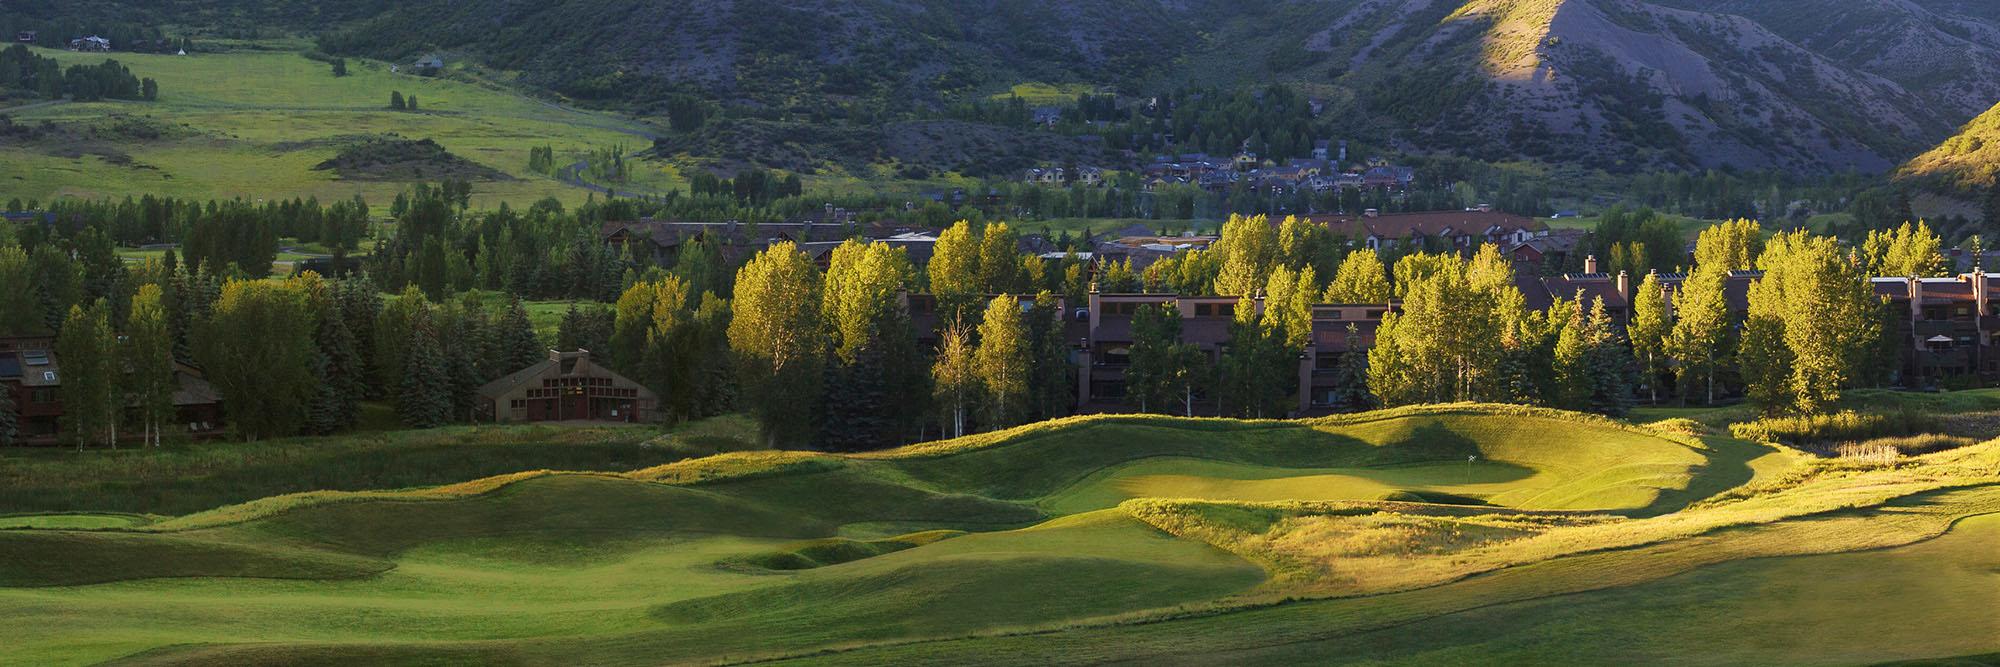 Golf Course Image - Snowmass No. 8